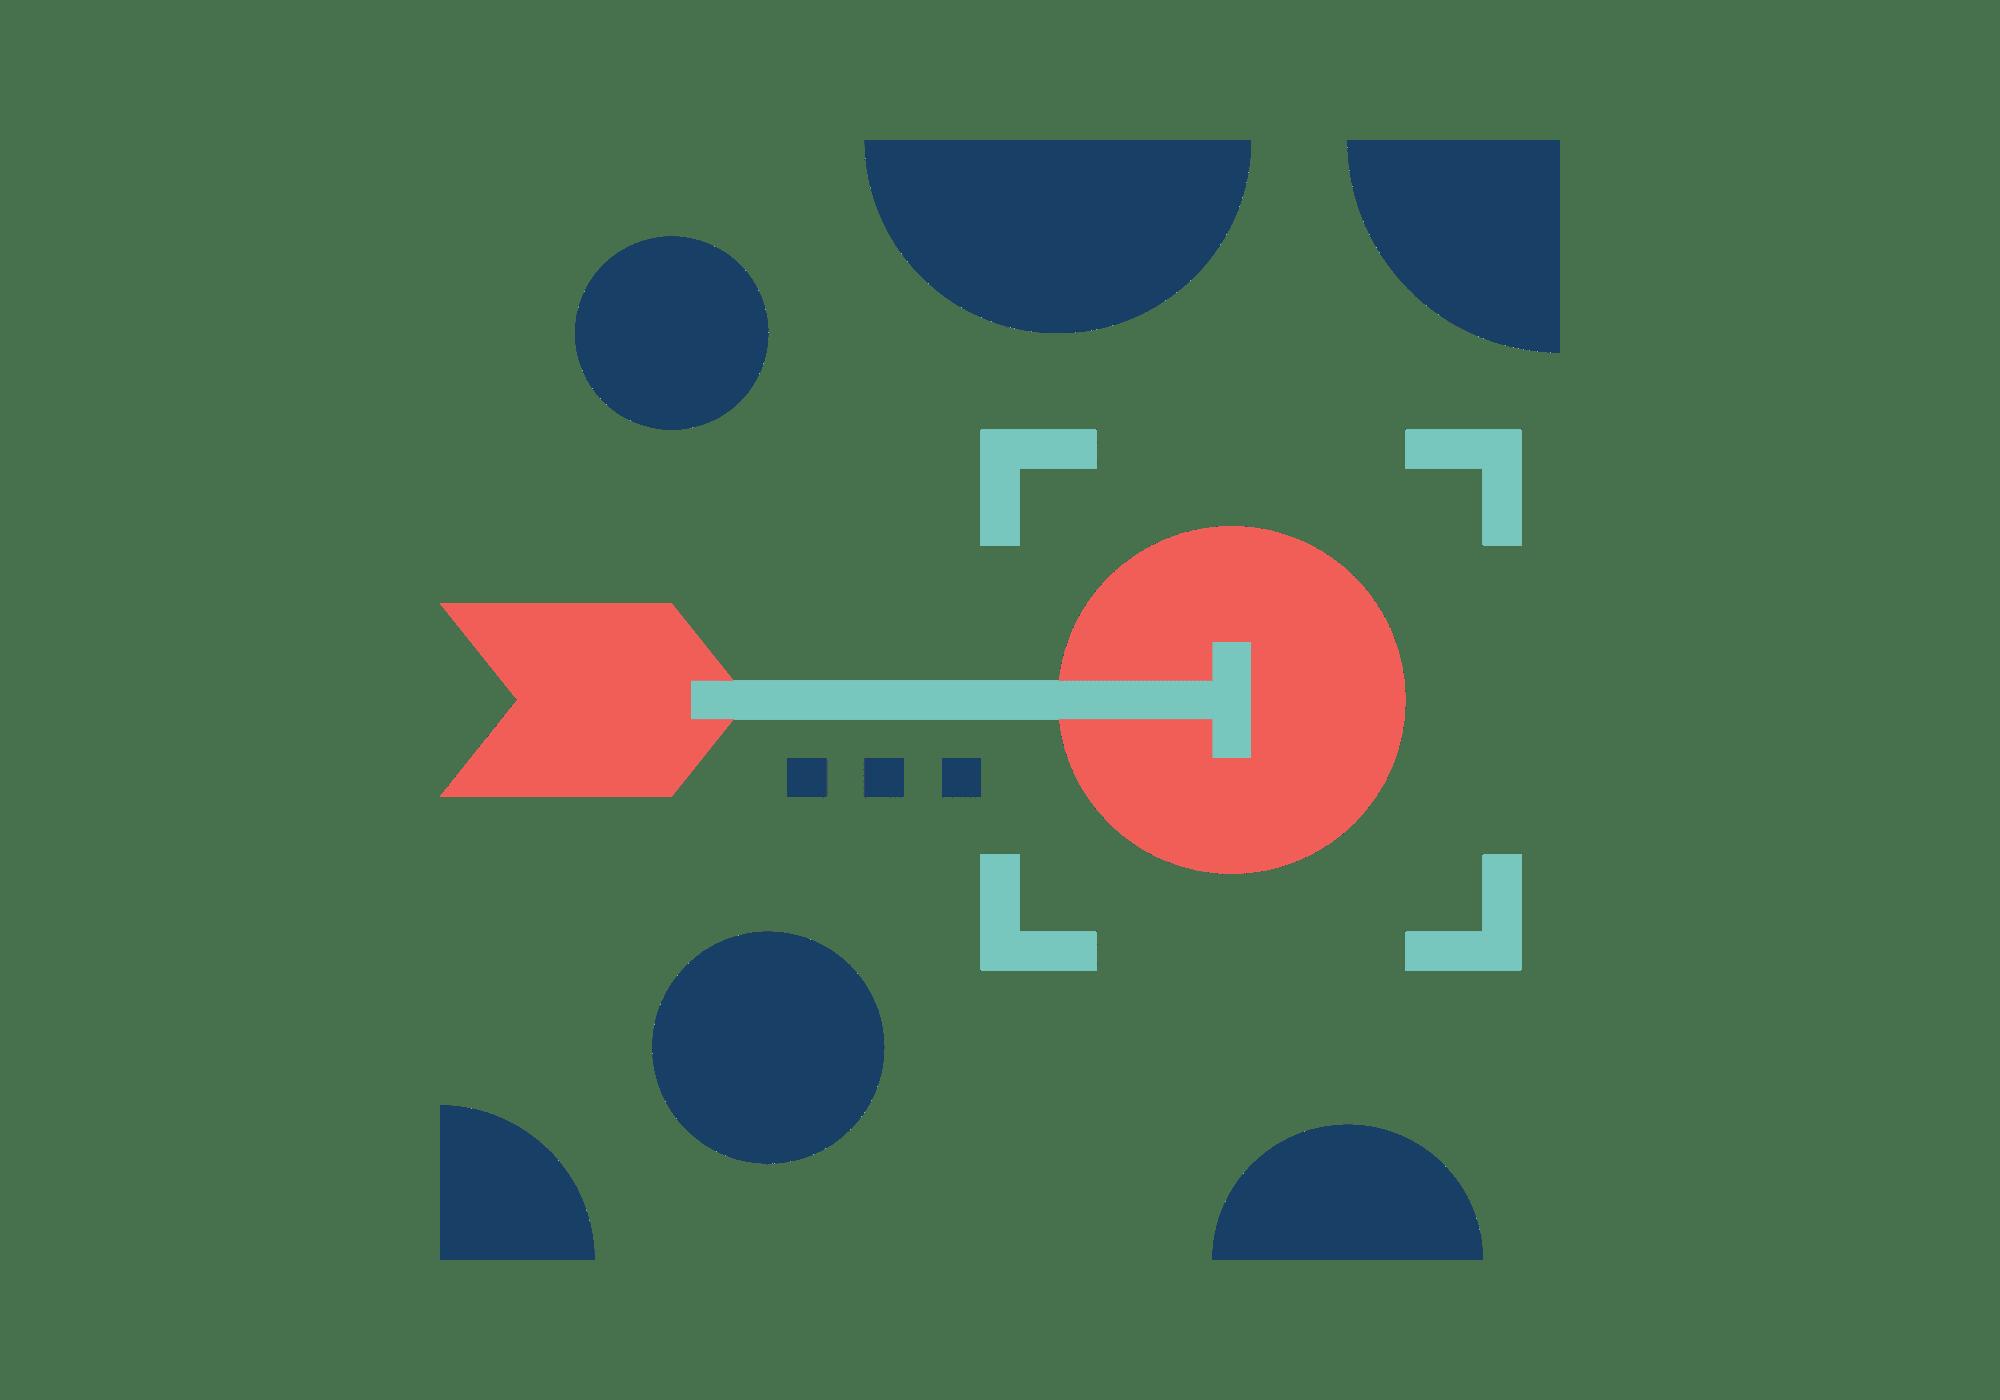 Zoekwoordenonderzoek - Kollektif Media